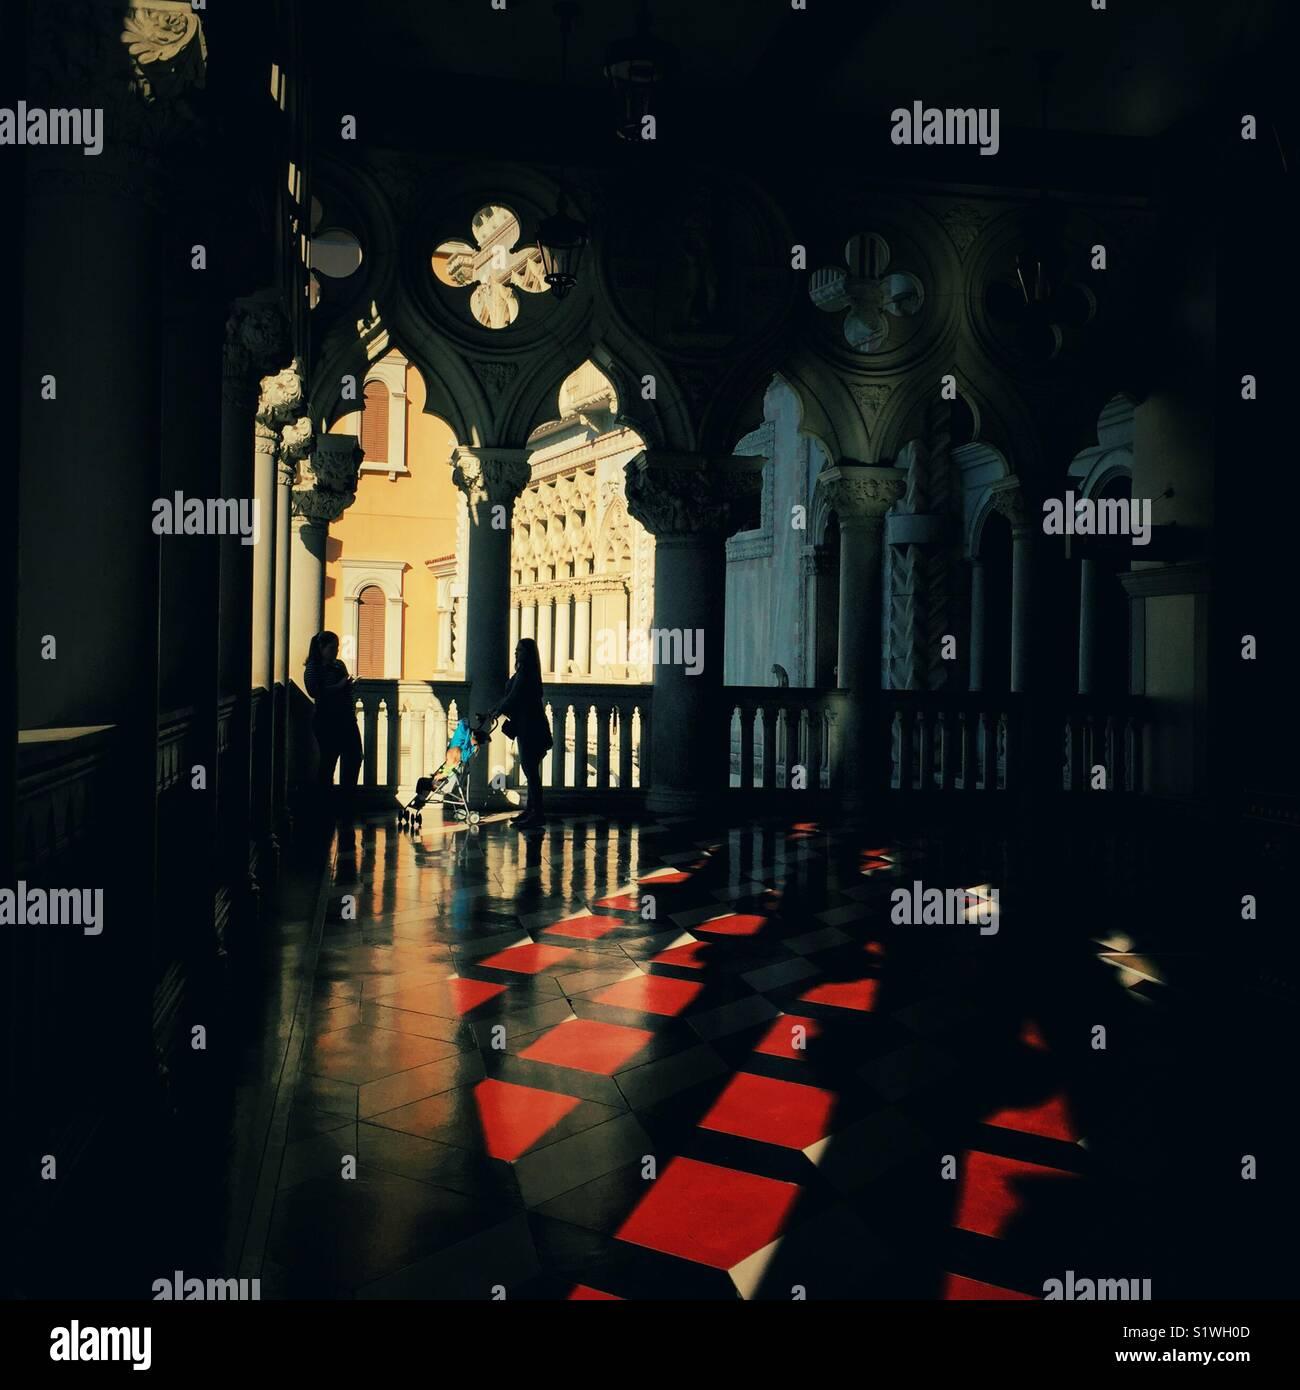 Shadows And Light In Venice Stock Photos Venezia Antique Bronze Wire Wall Evening Casts Long Hotel Las Vegas Nevada Image